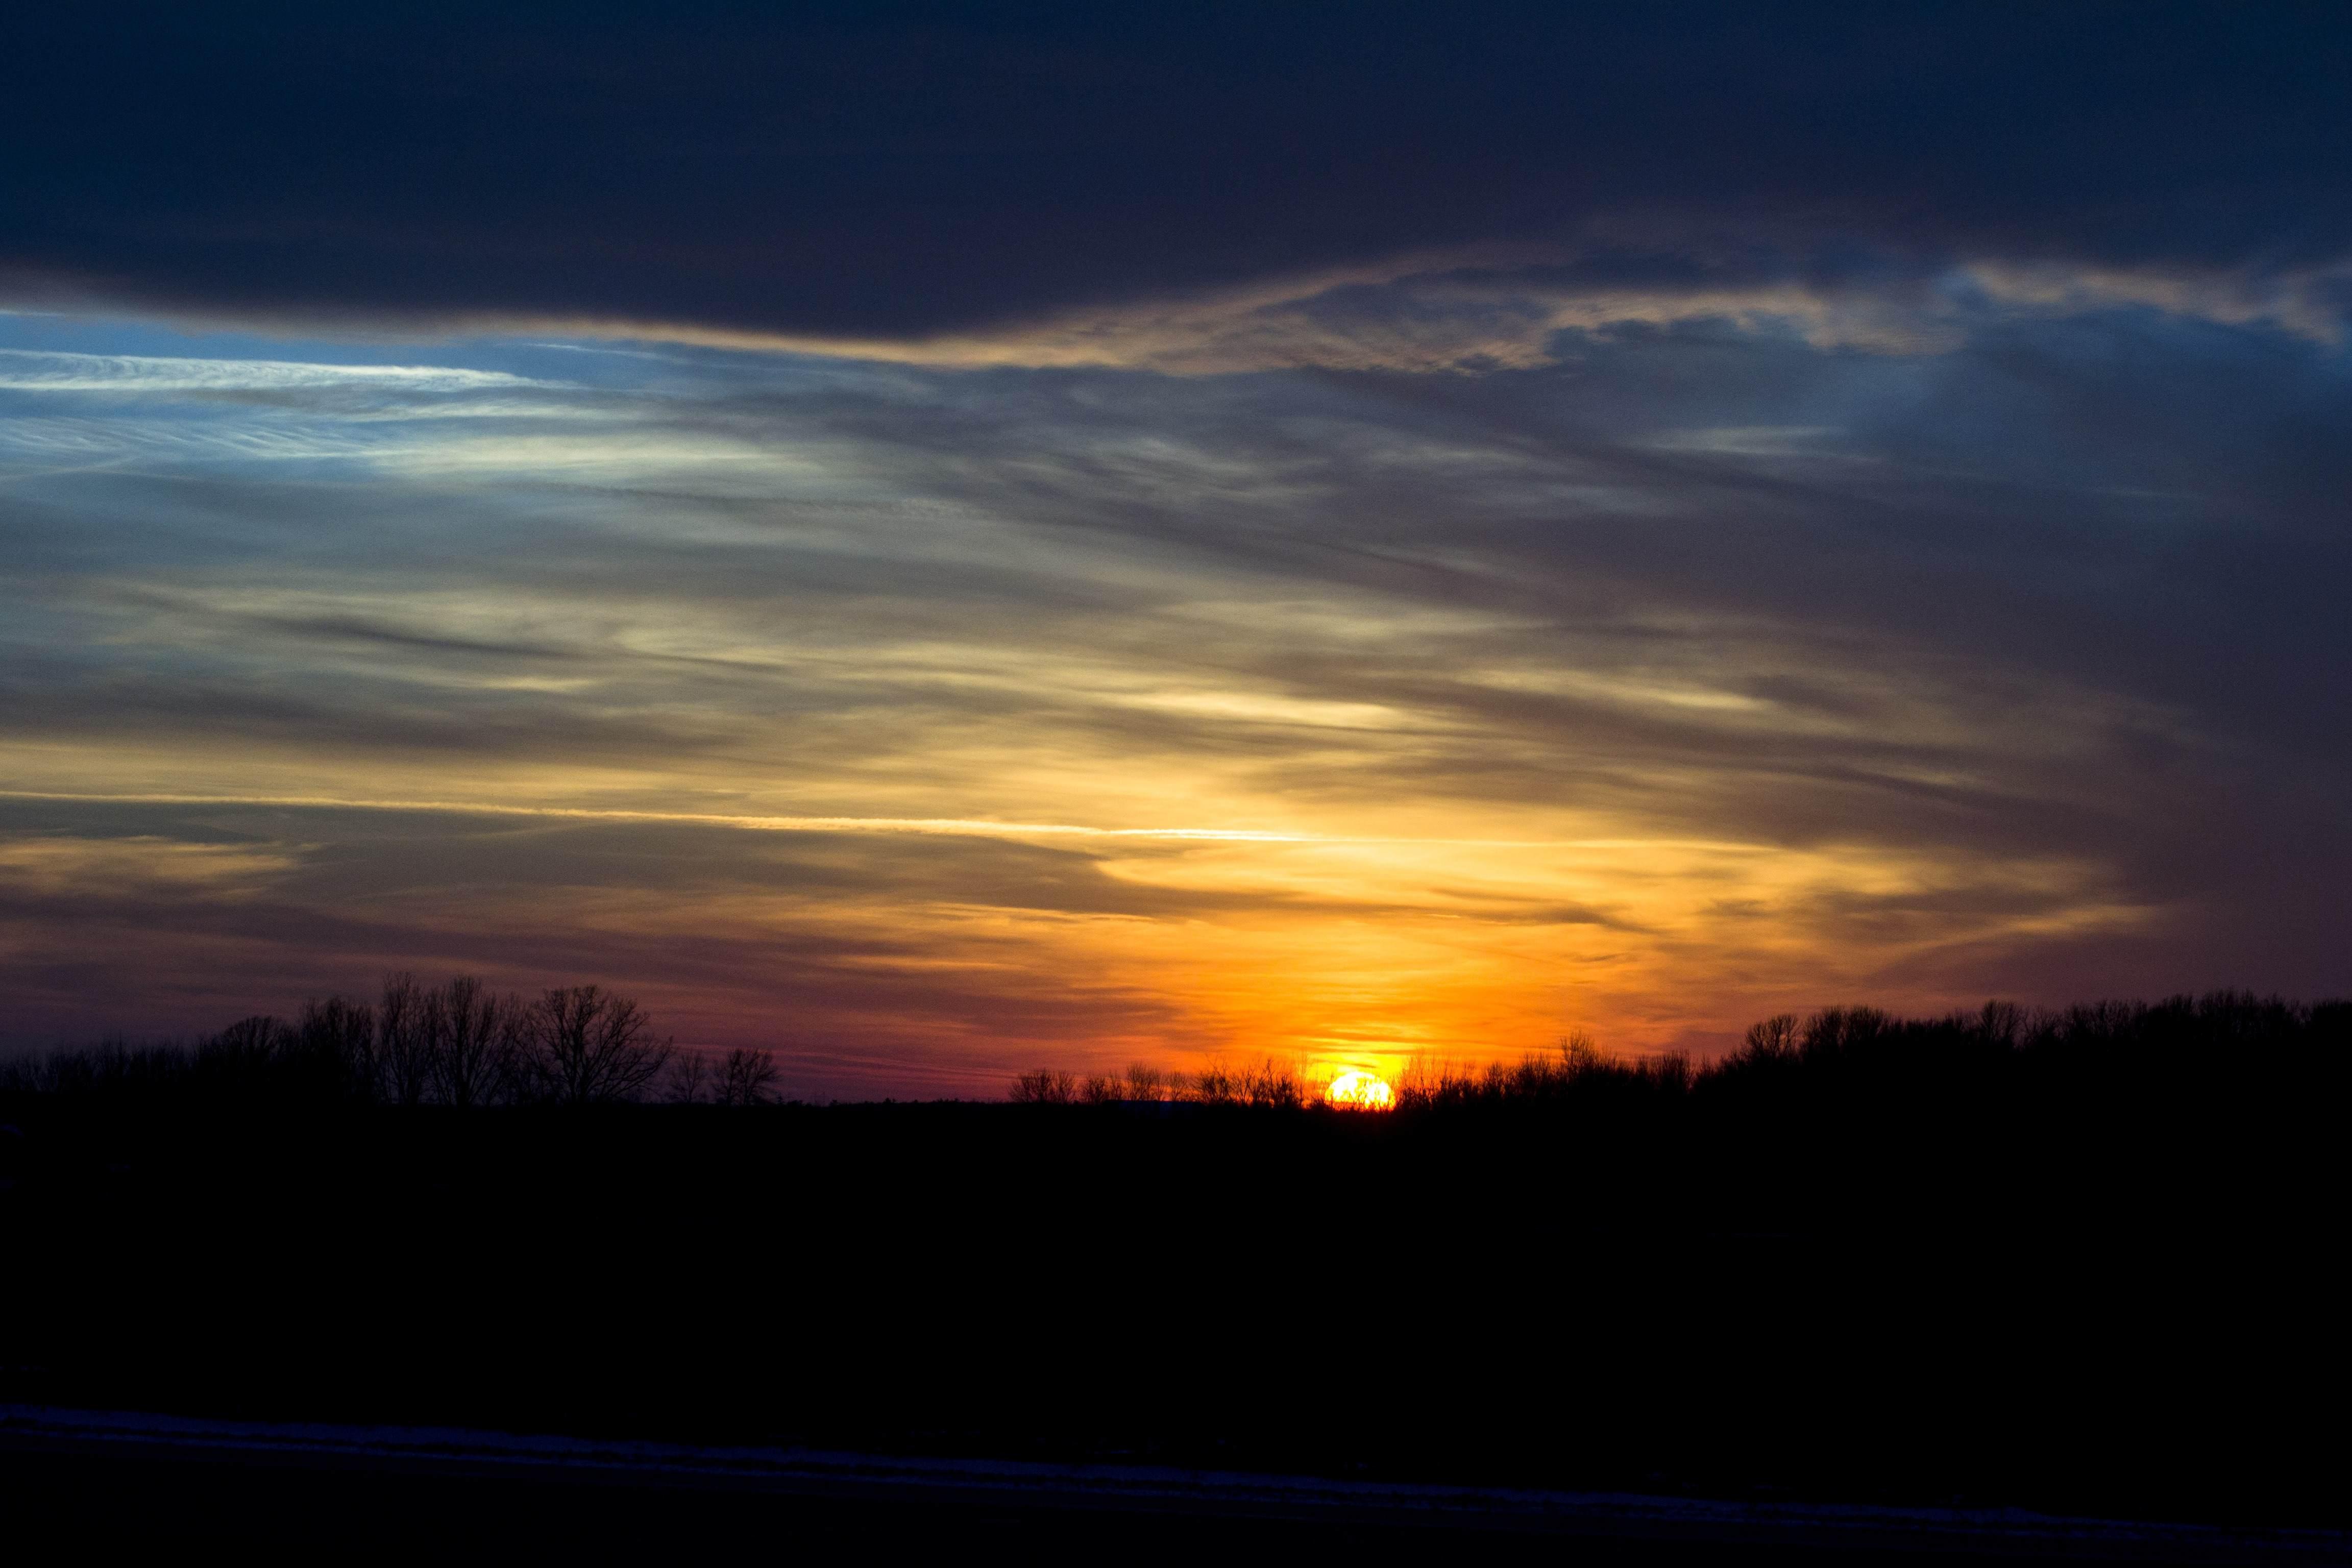 sunset-111920